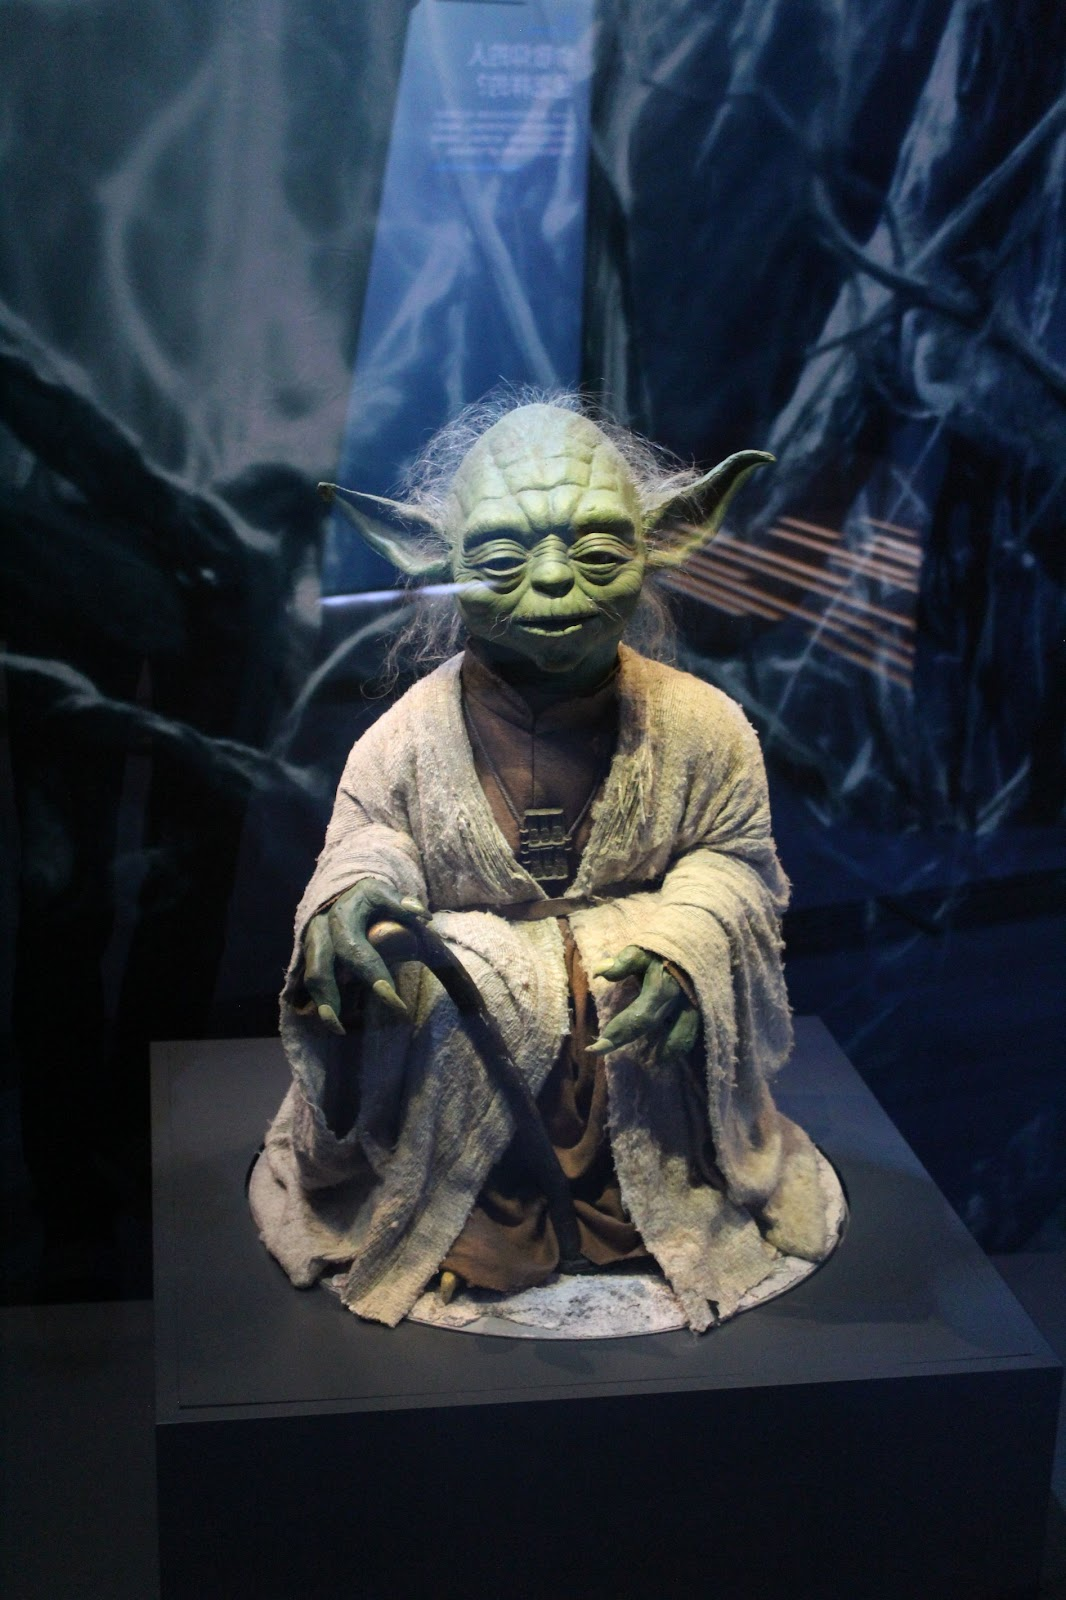 Muppet model of Yoda